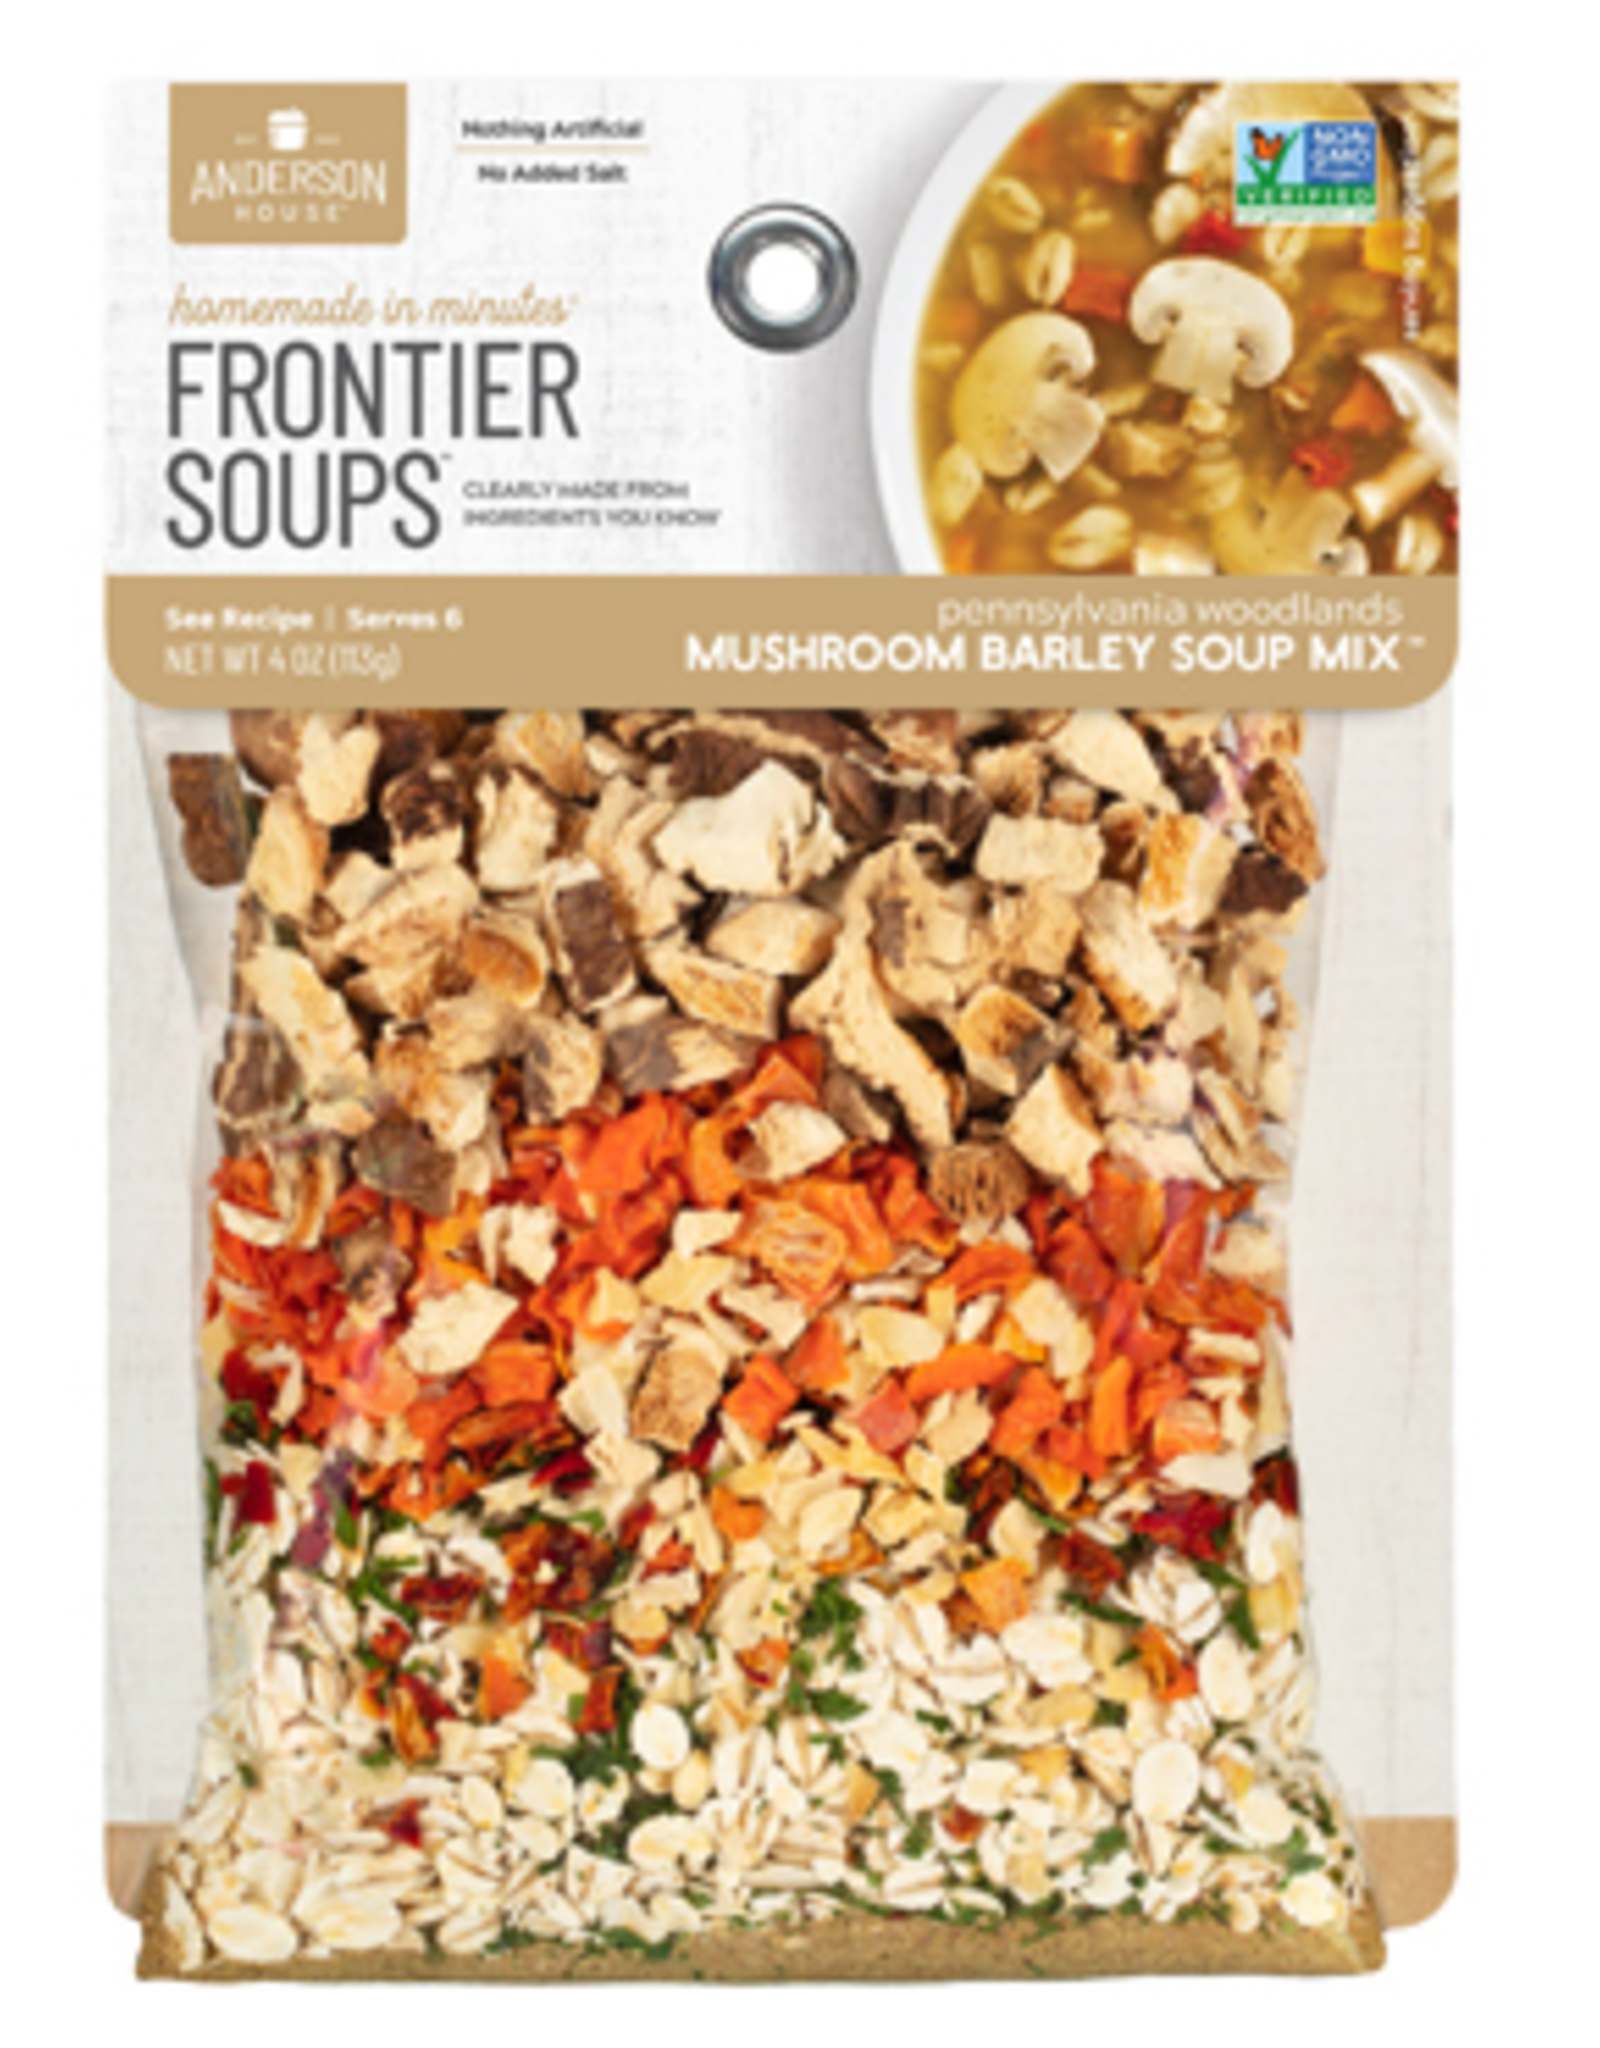 Frontier Soups Pennsylvania Woodlands Mushroom Barley Soup Mix